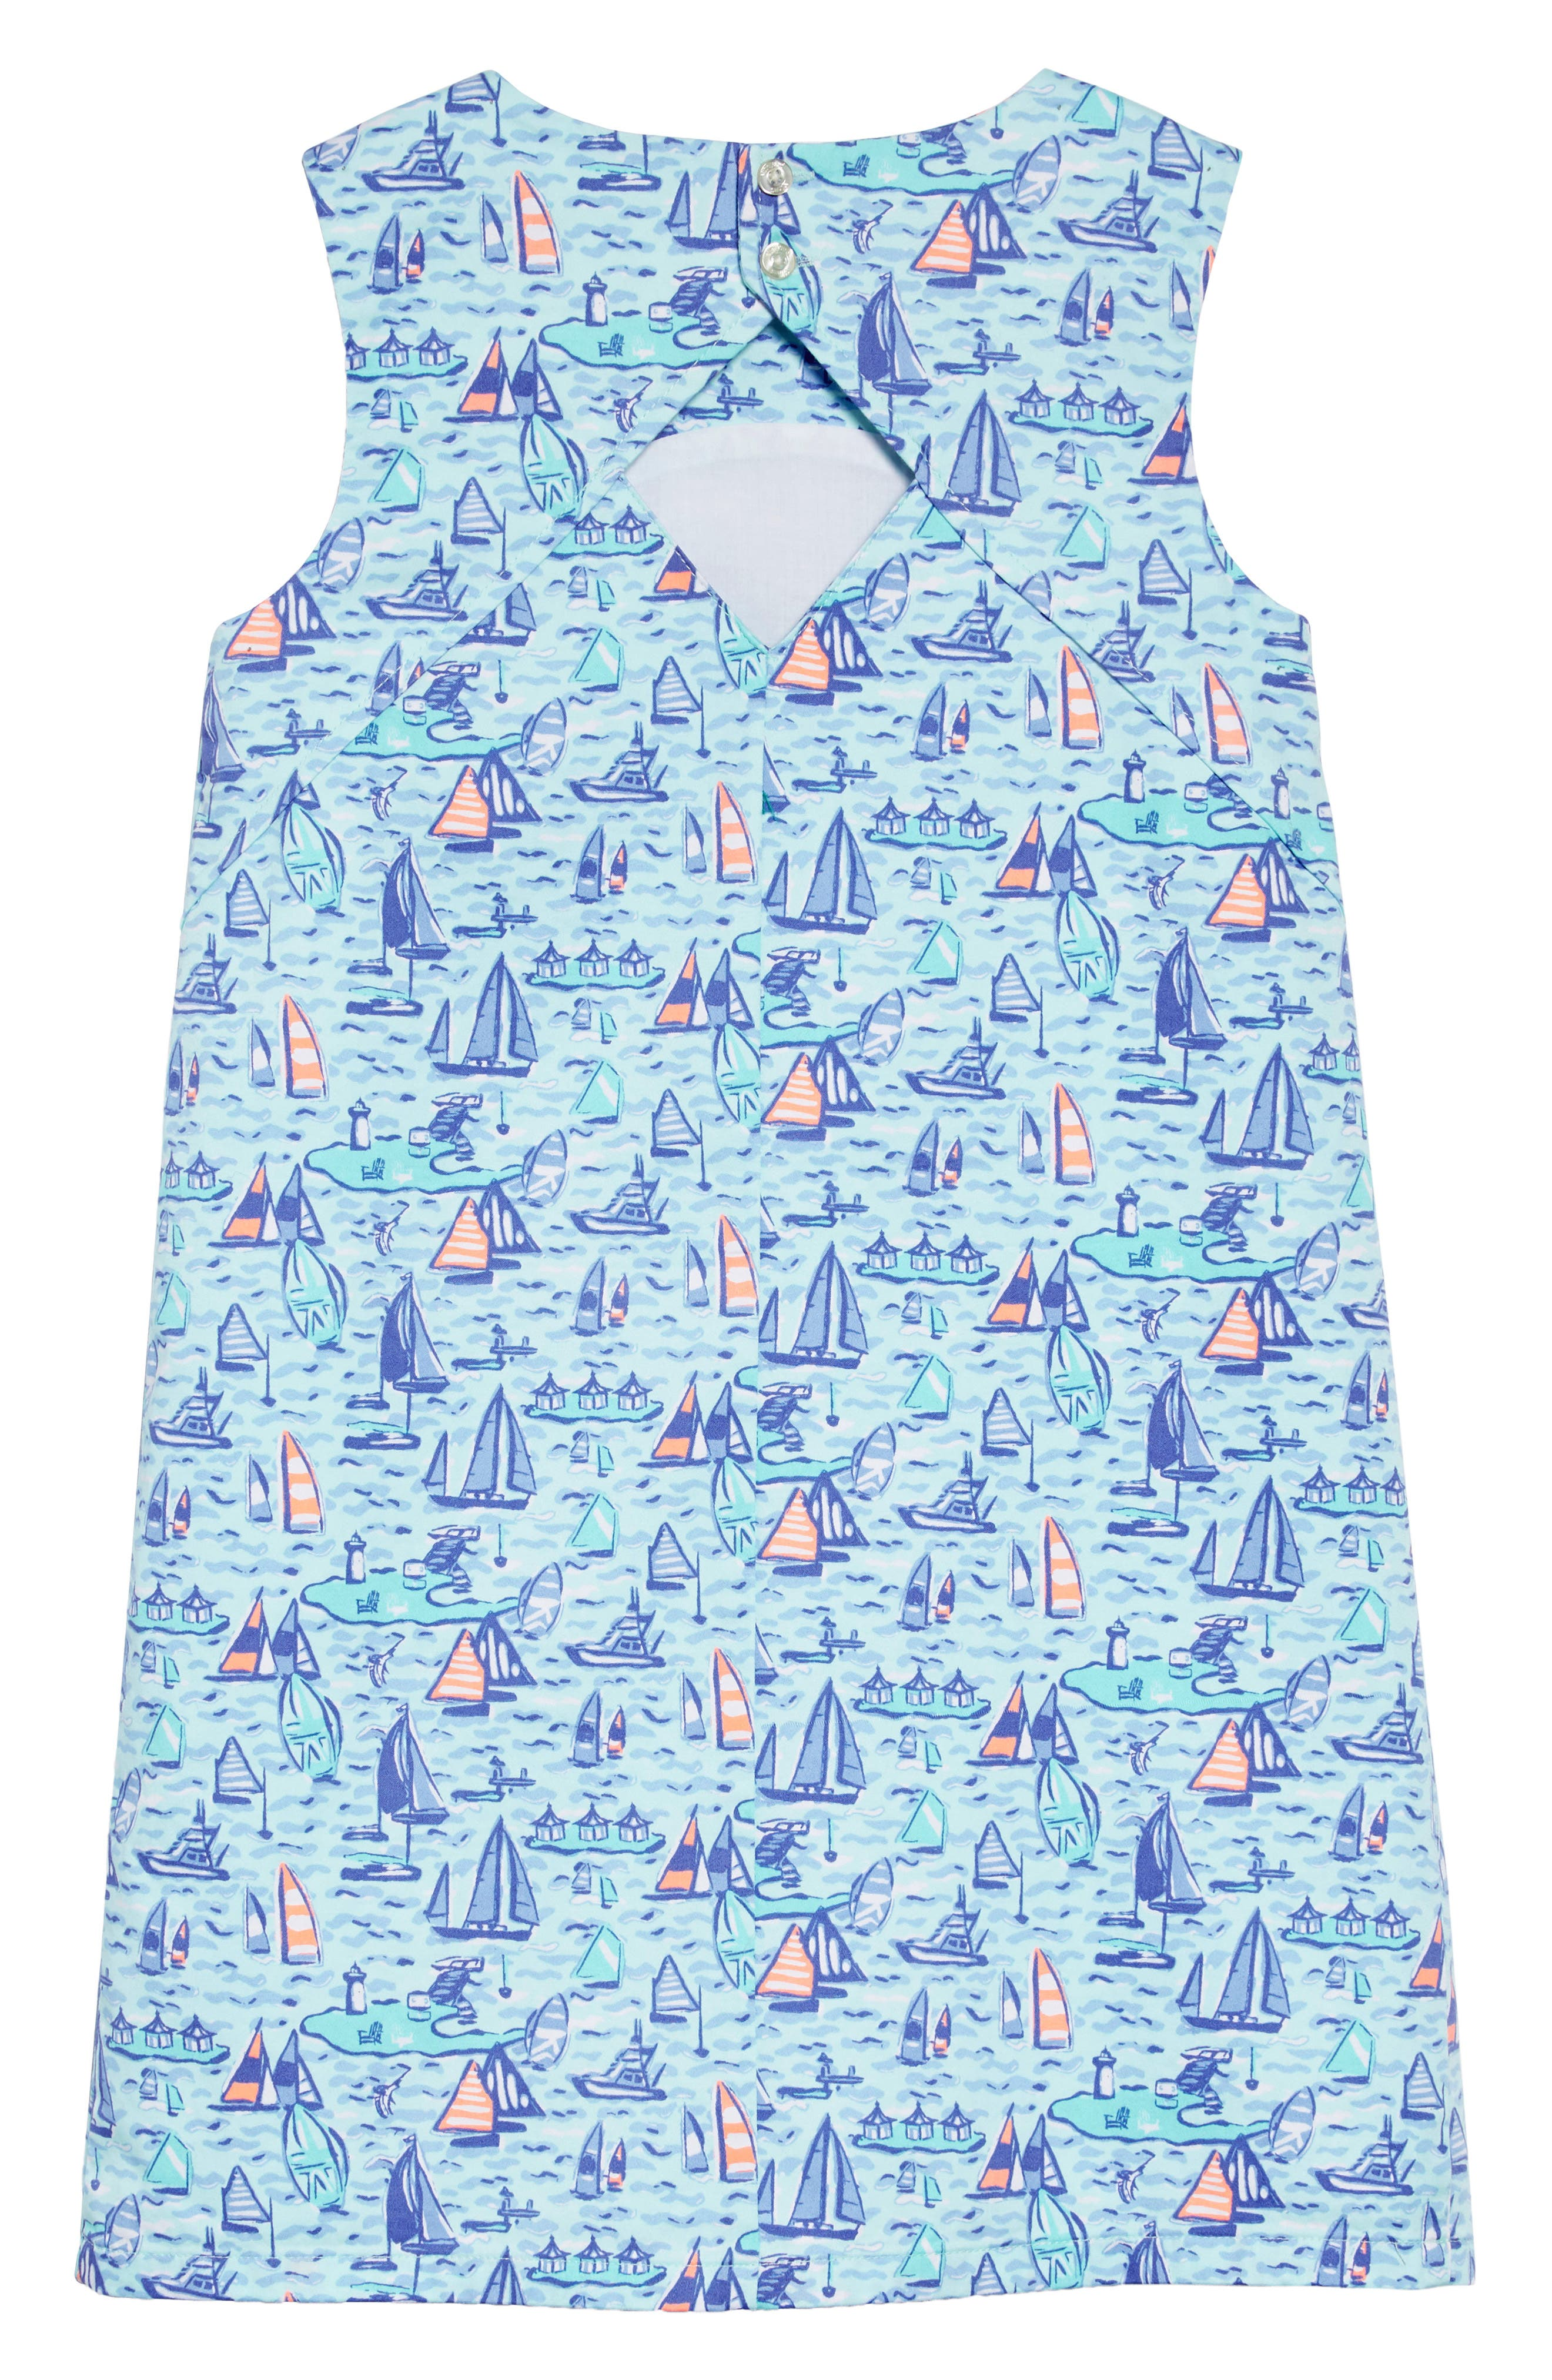 Sailing Diamond Back Cutout Dress,                             Alternate thumbnail 2, color,                             CRYSTAL BLUE